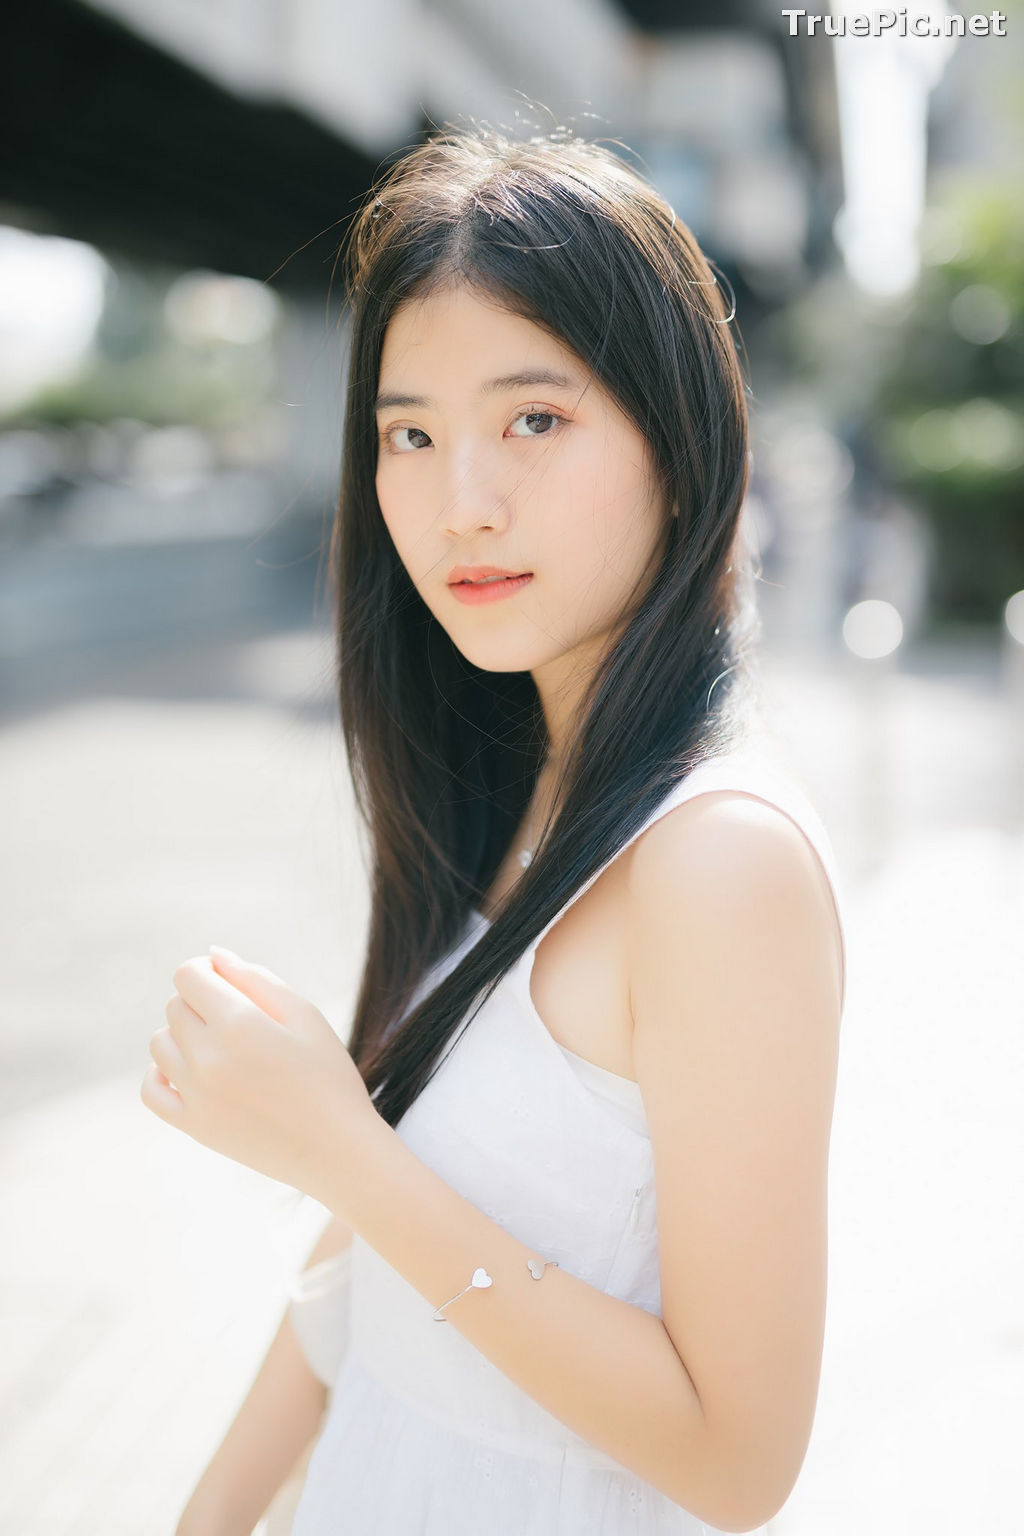 Image Thailand Model - Venita Loywattanakul - A Beautiful White - TruePic.net - Picture-6